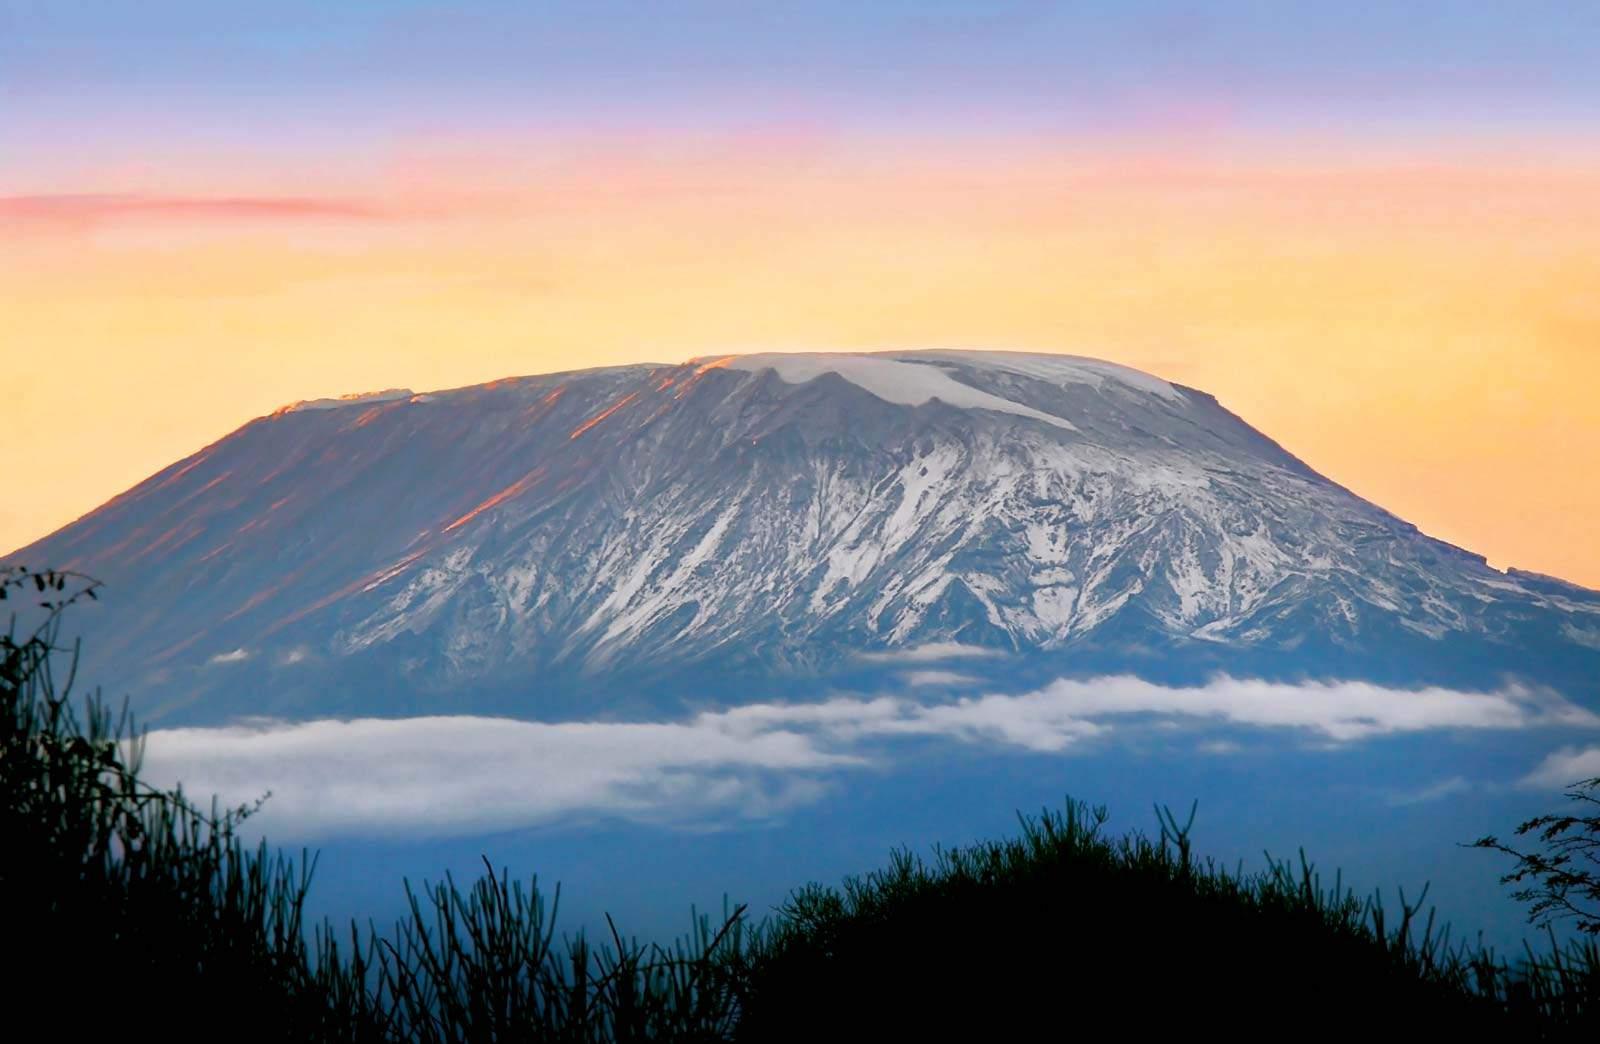 Sunrise Mount Kilimanjaro Tanzania